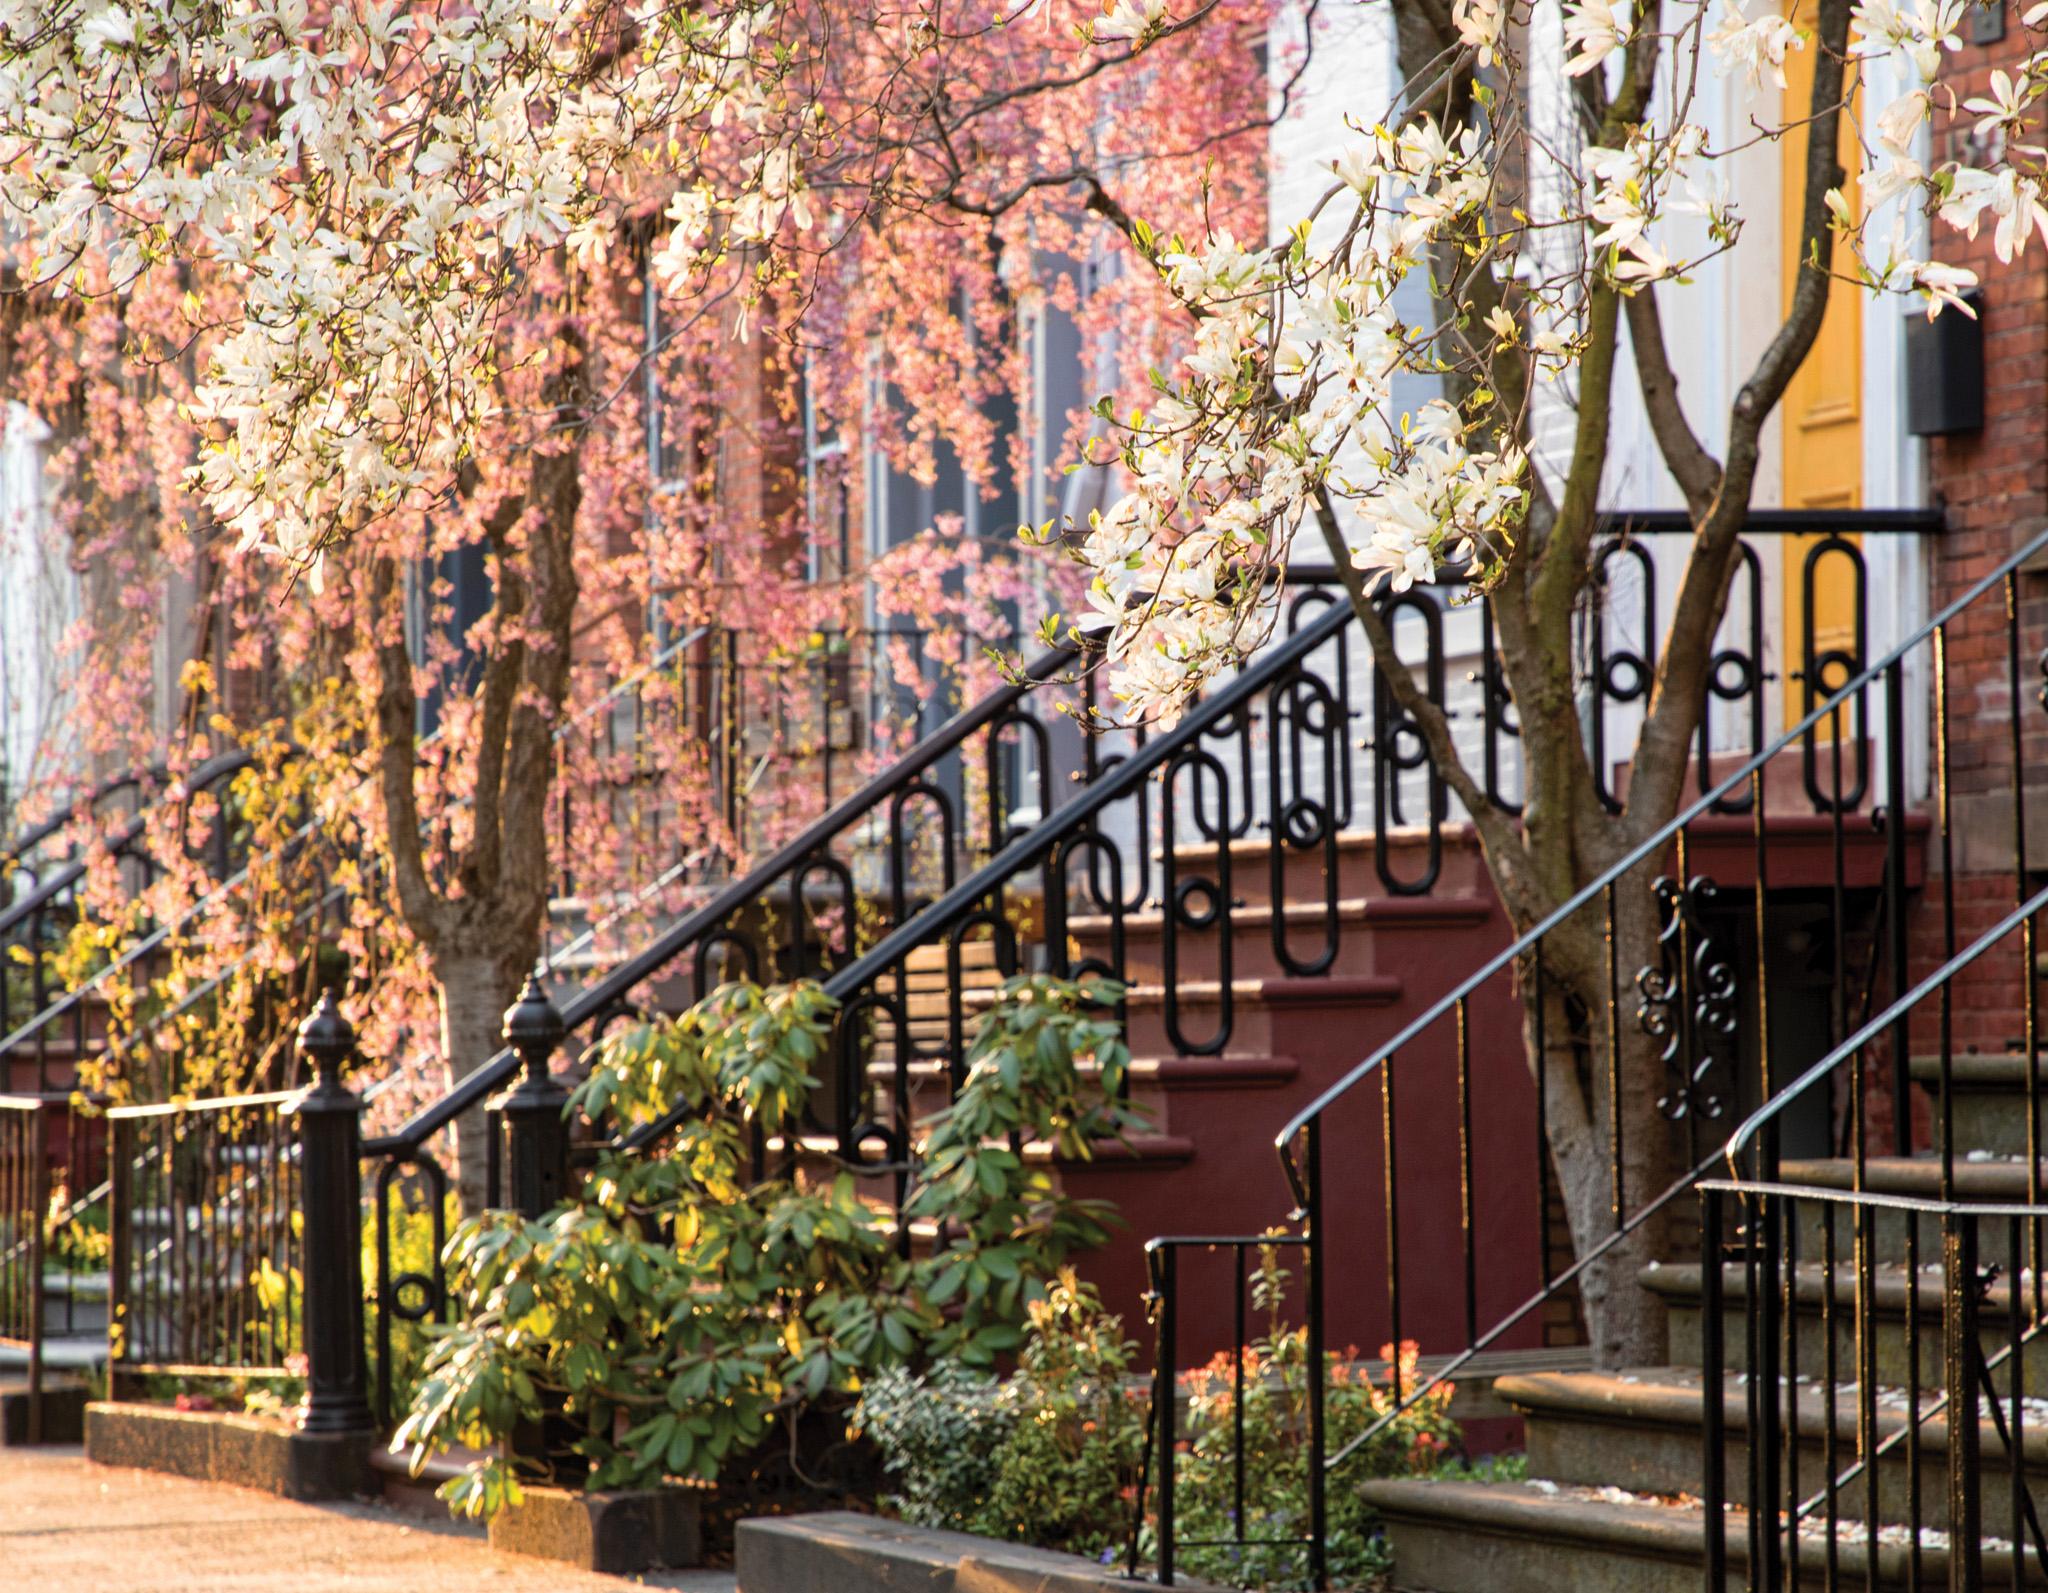 April: Hughes Place